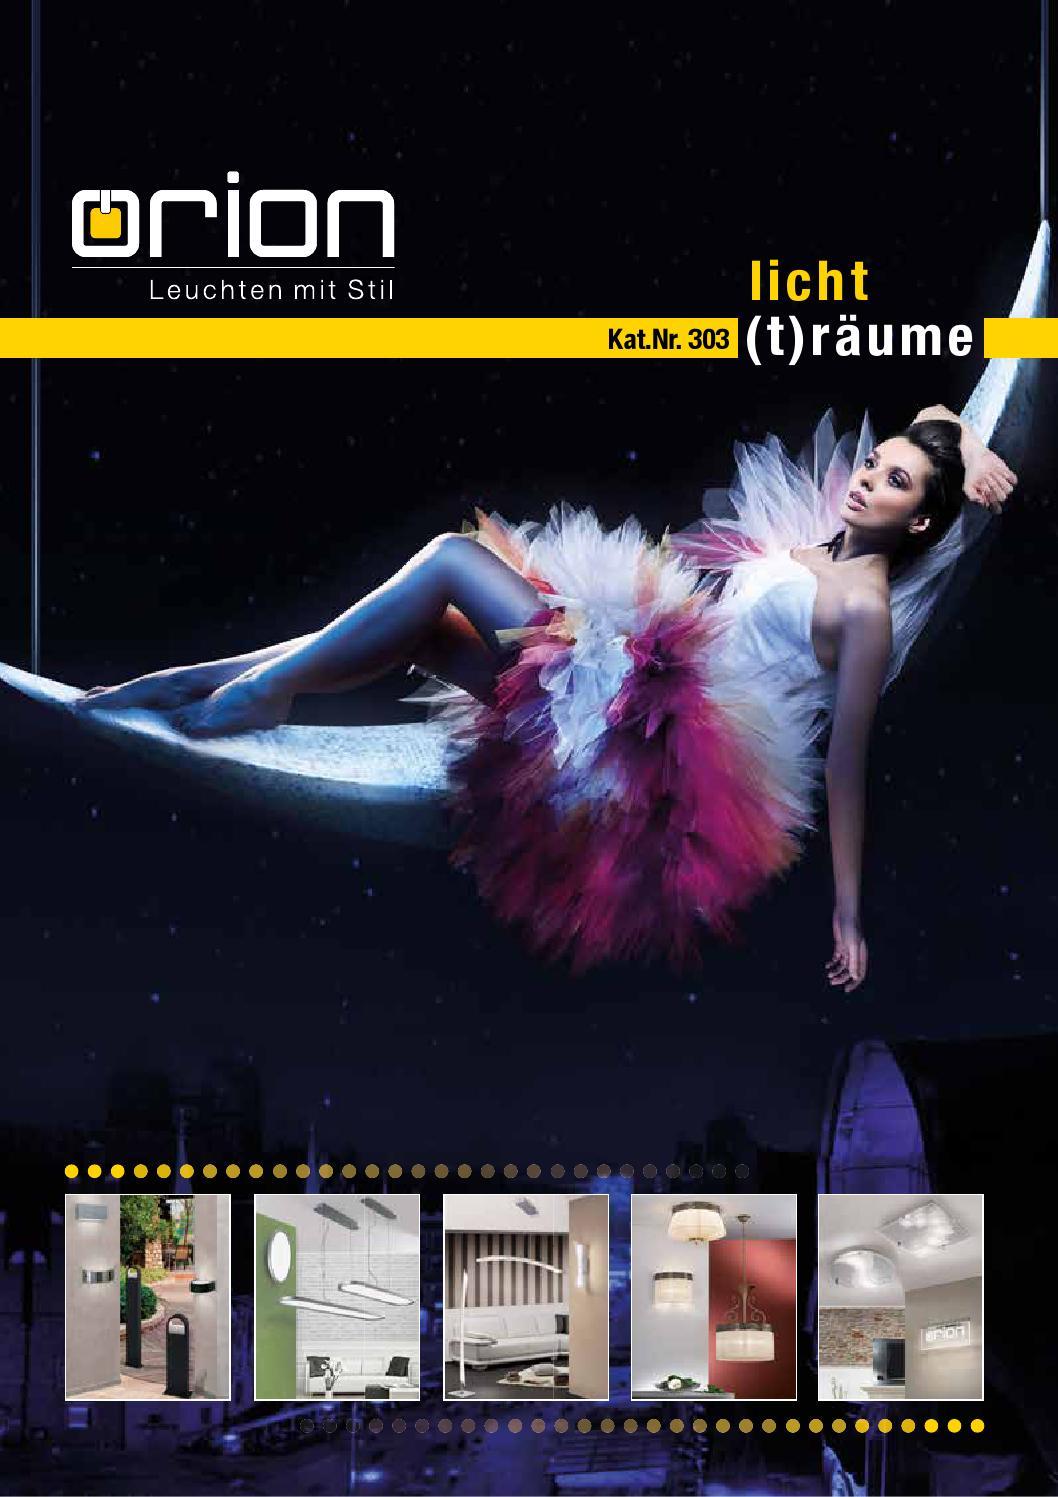 Orion Katalog Nr 303 Licht Traume Neuheiten By Freziya Lajt